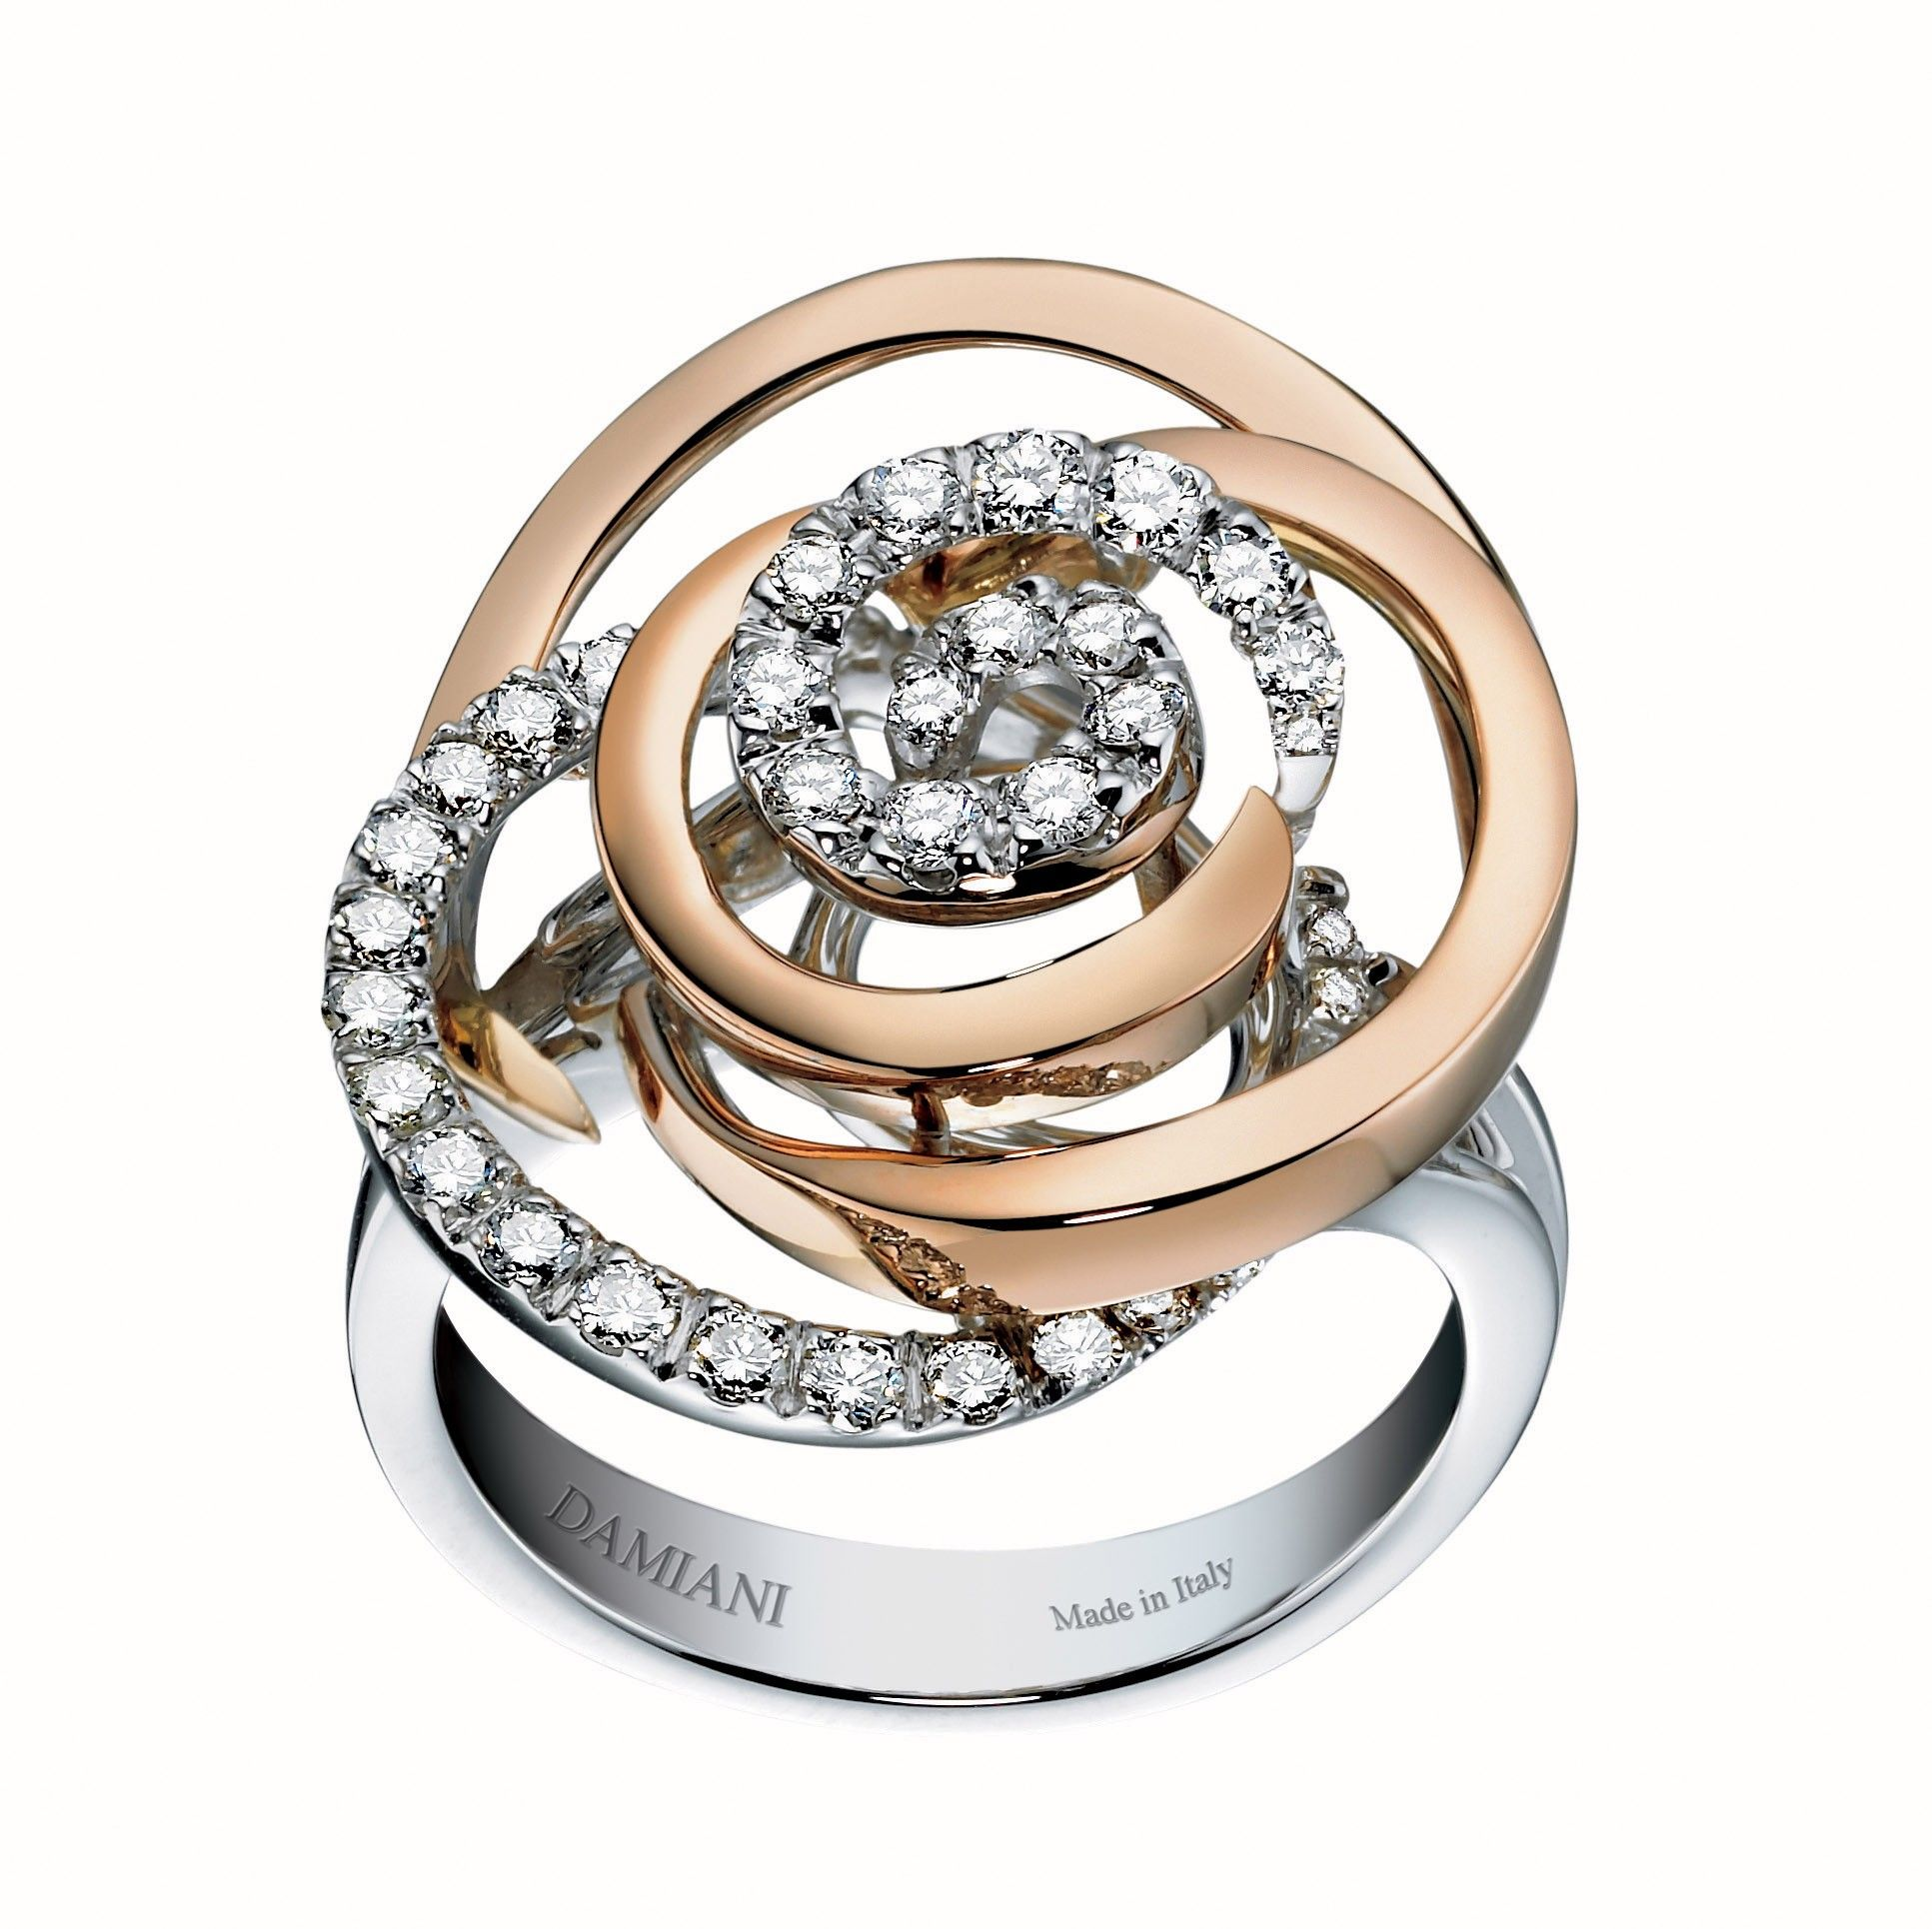 Right Hand Diamond Rings For Women  Damiani, Diamond Righthand Ring